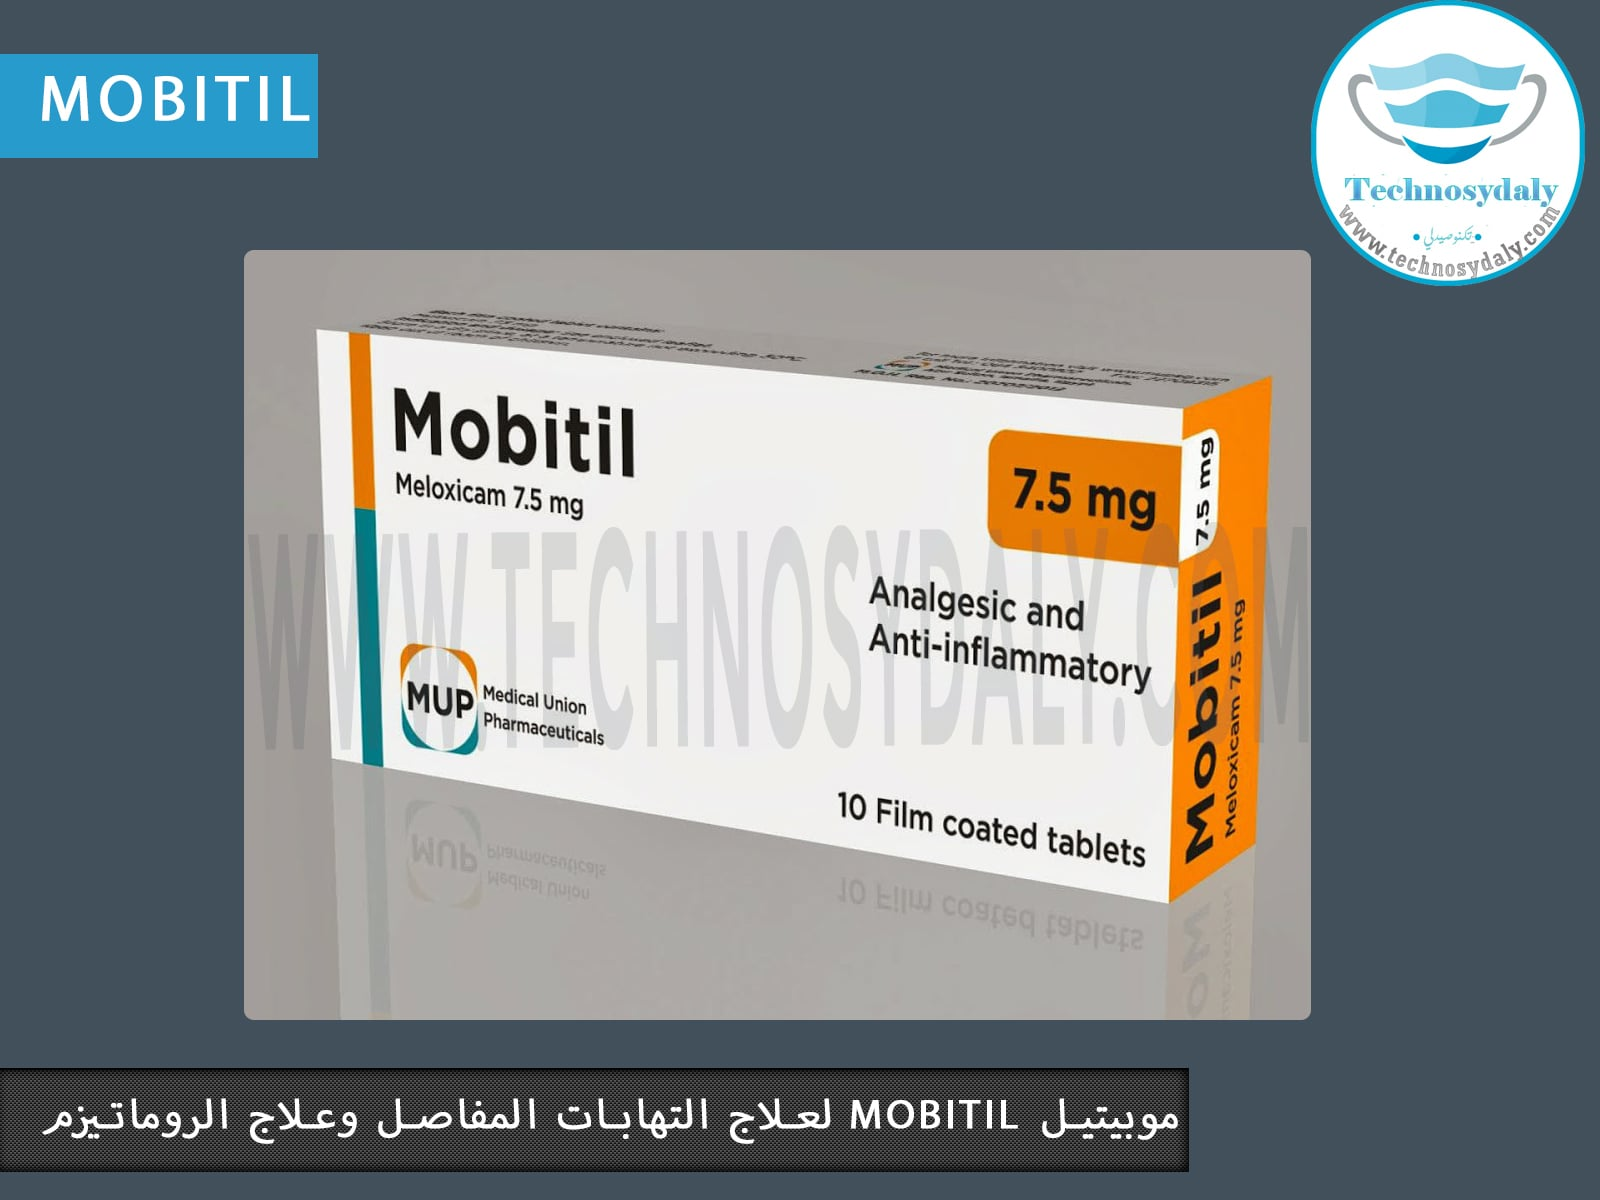 MOBITIL 7.5 MG